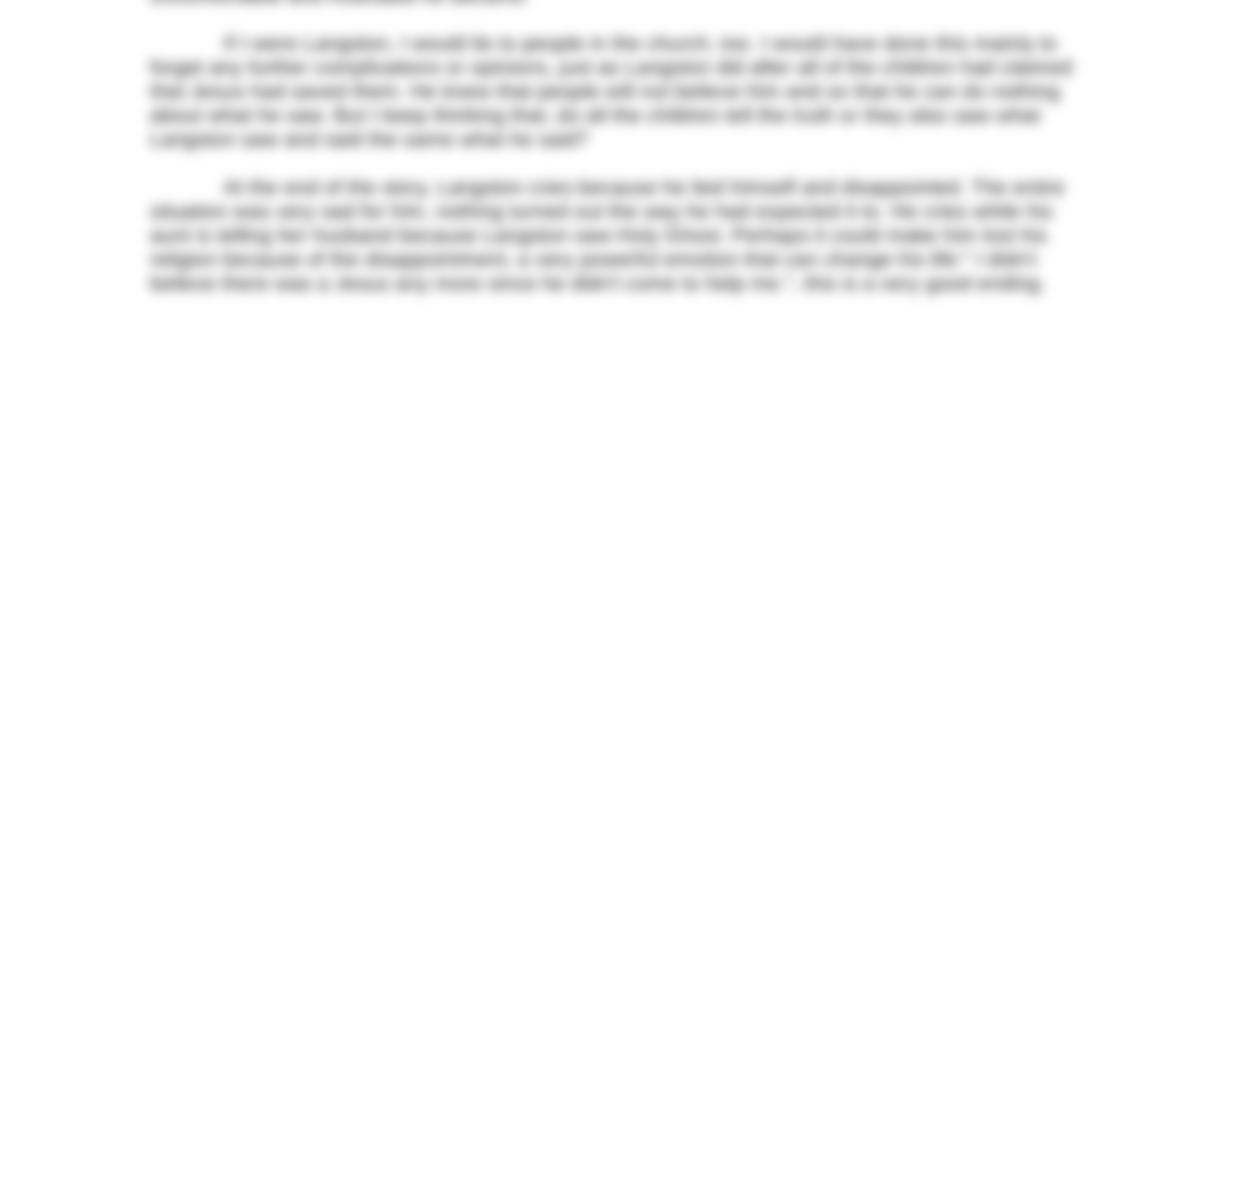 salvation experience essay